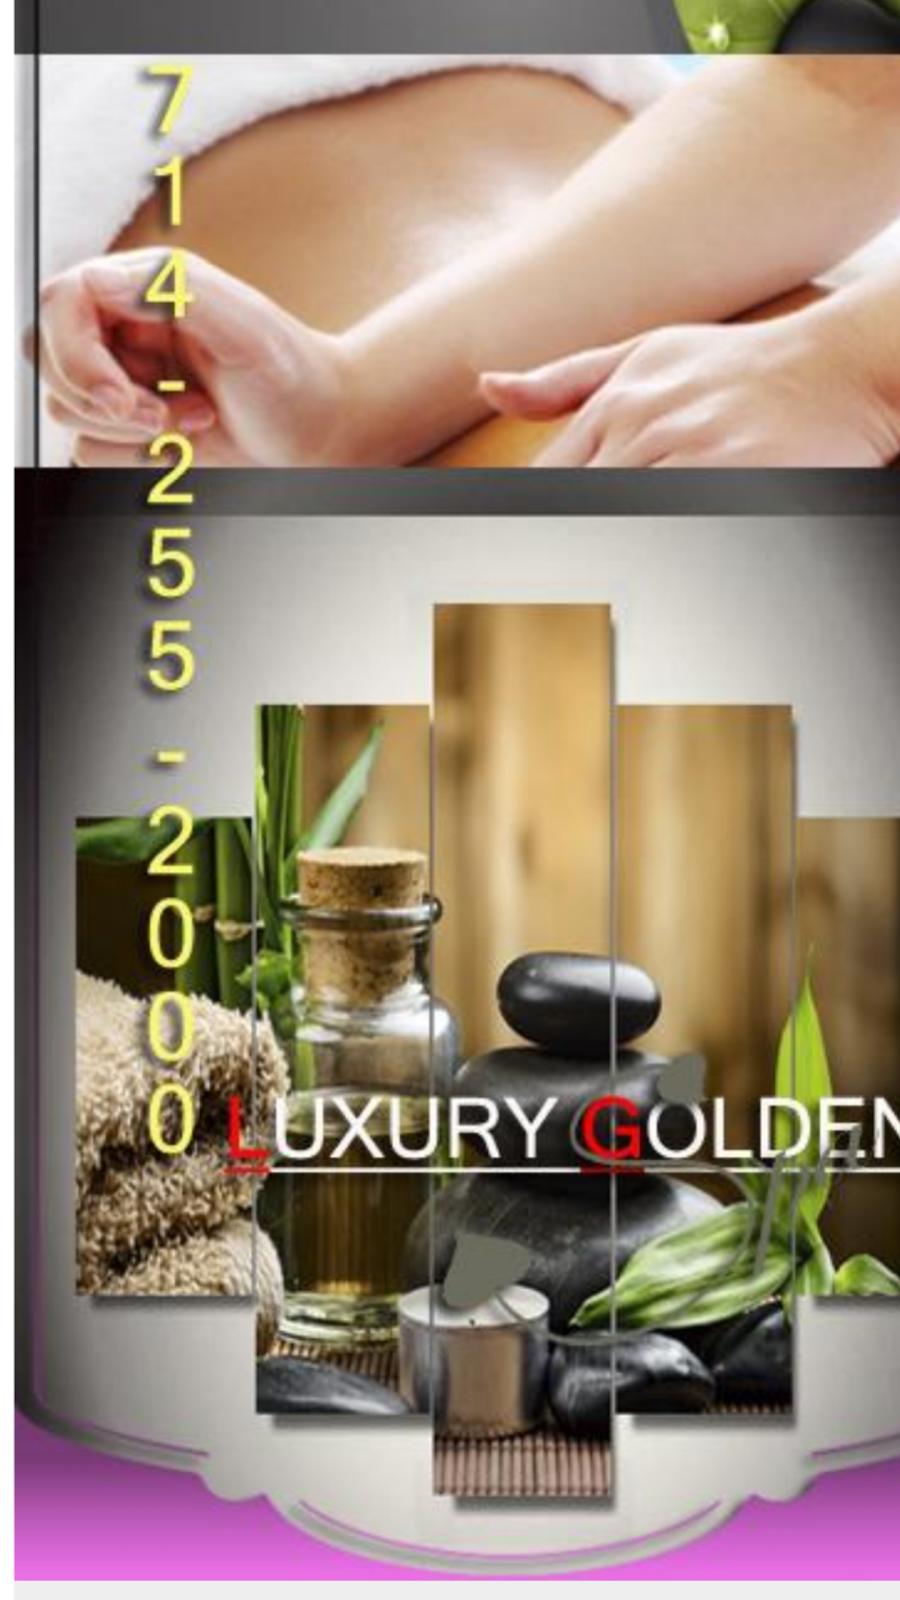 Luxury Golden Spa - spa  | Photo 5 of 5 | Address: 405 S State College Blvd B.101, Brea, CA 92821, USA | Phone: (714) 255-2000